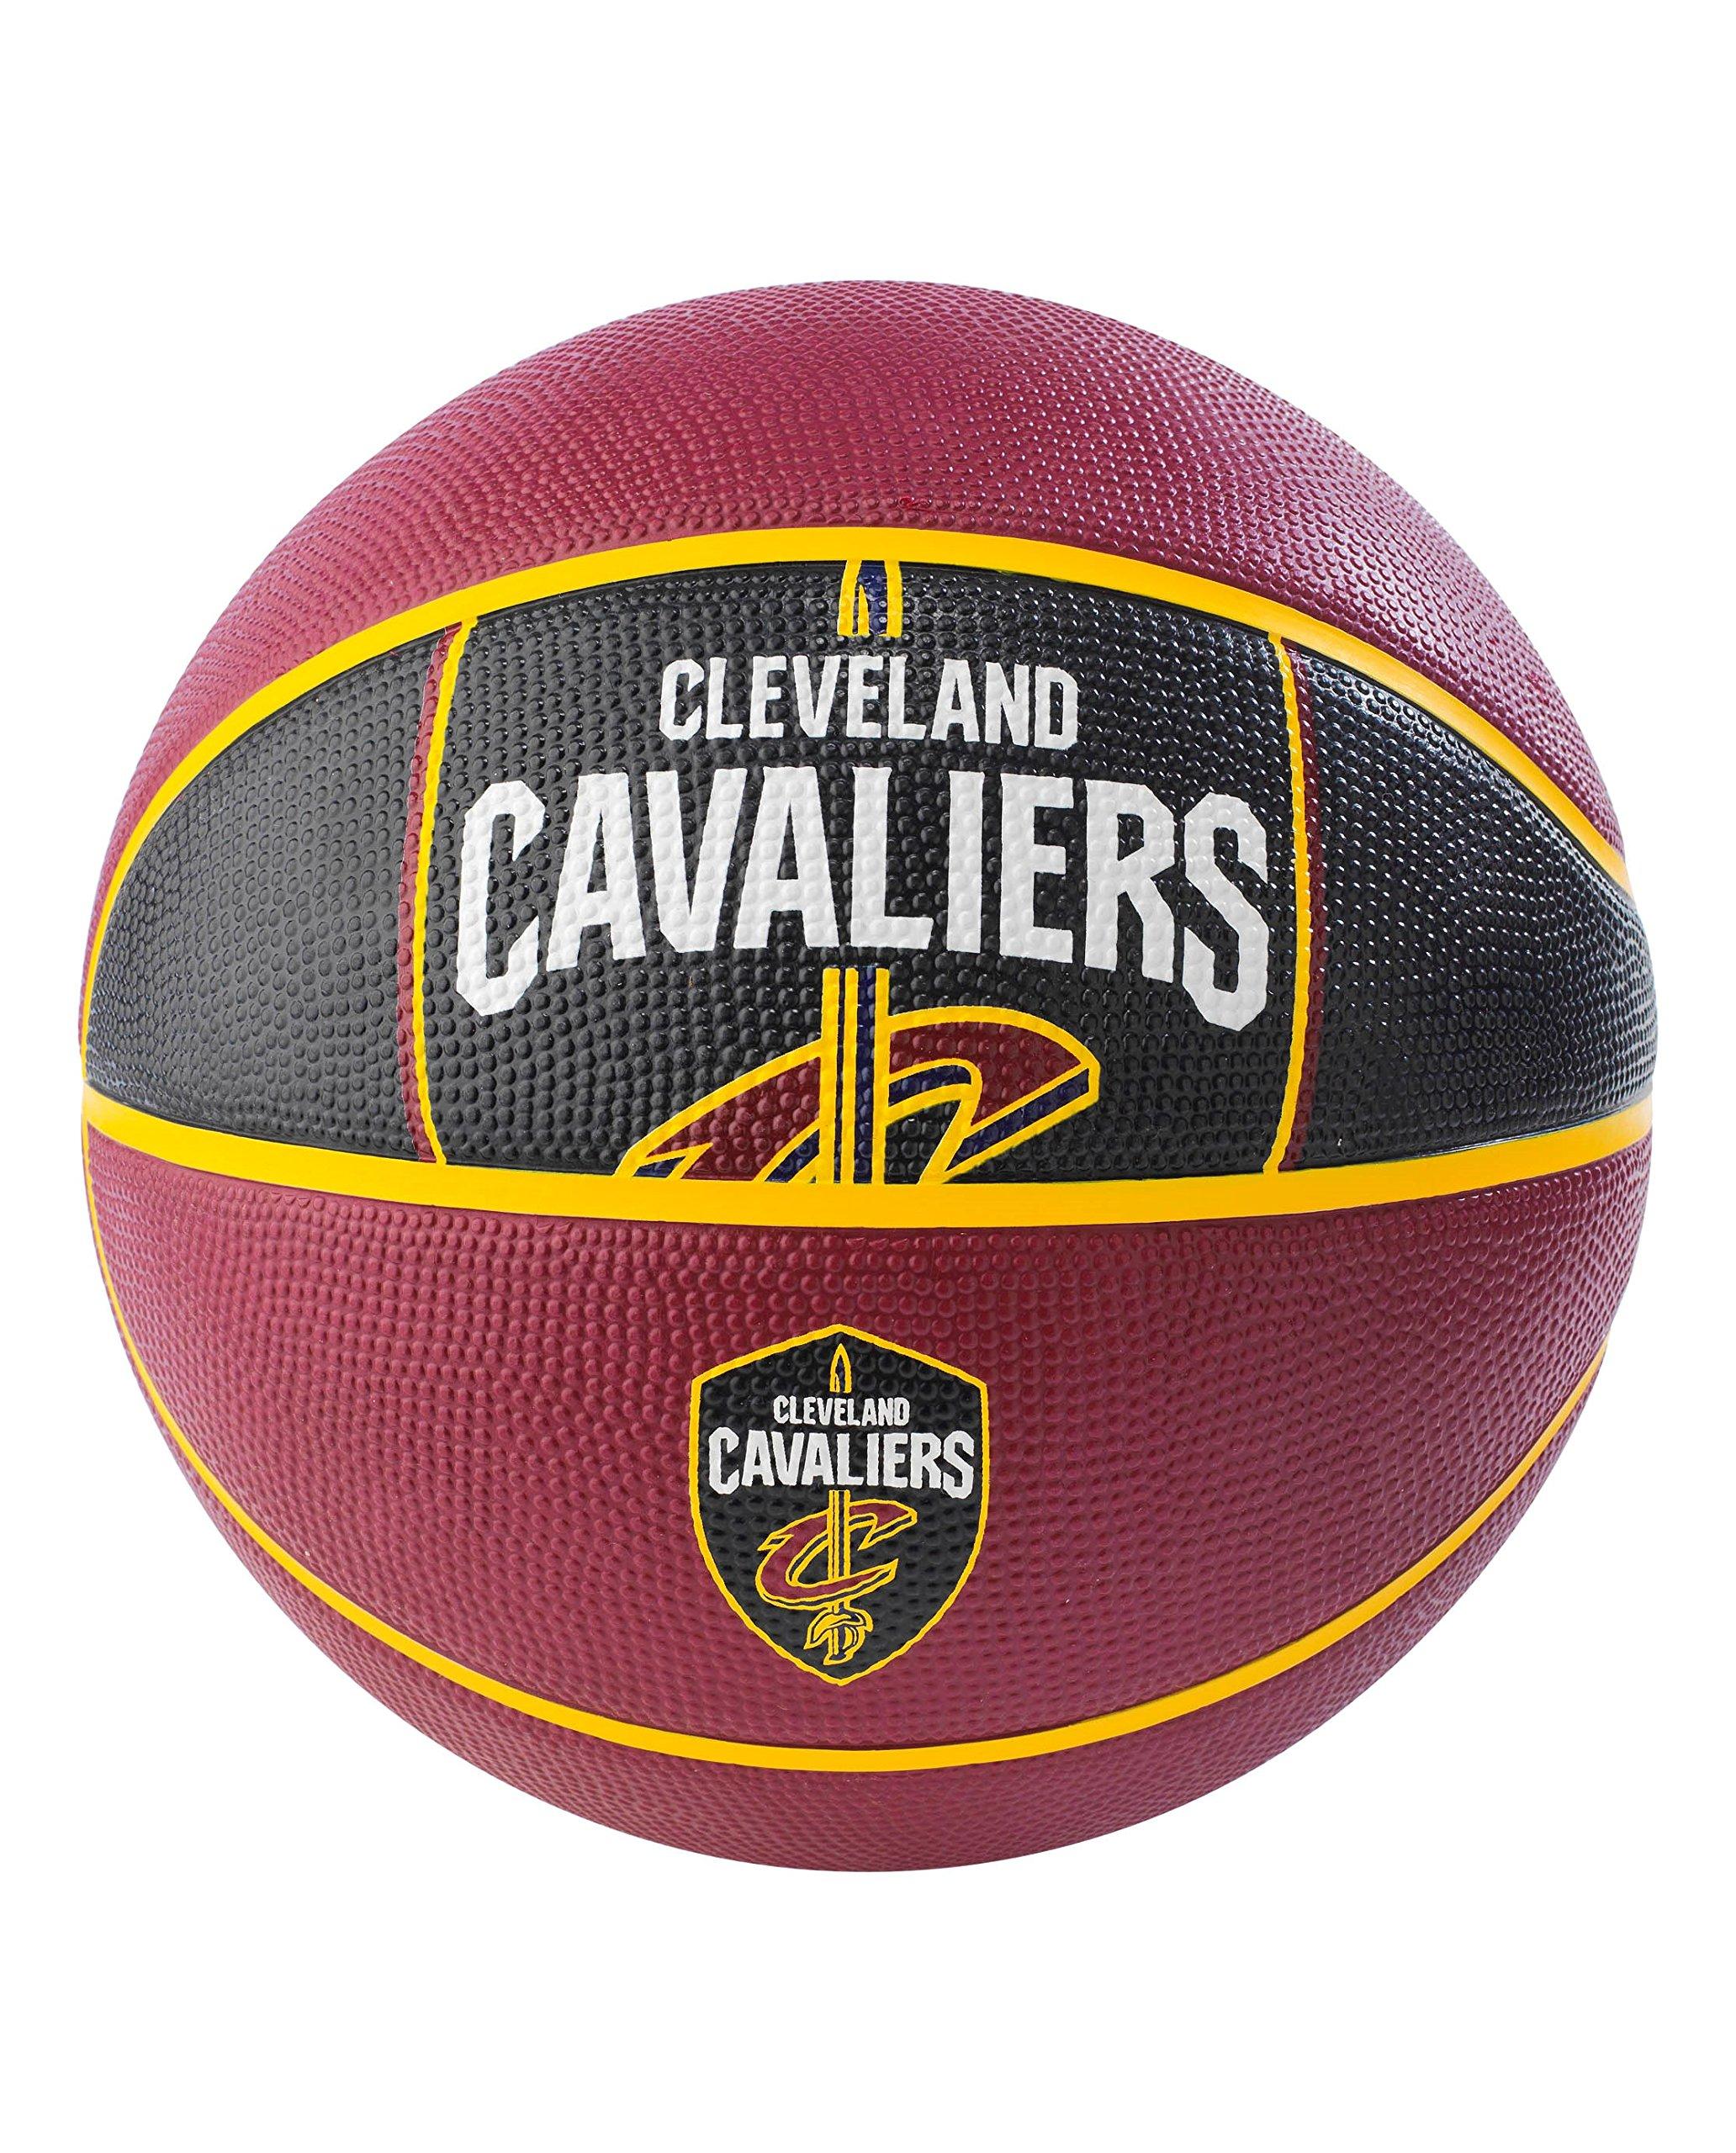 Spalding NBA Cleveland Cavaliers NBA Courtside Team Outdoor Rubber Basketballteam Logo, Maroon, 29.5''